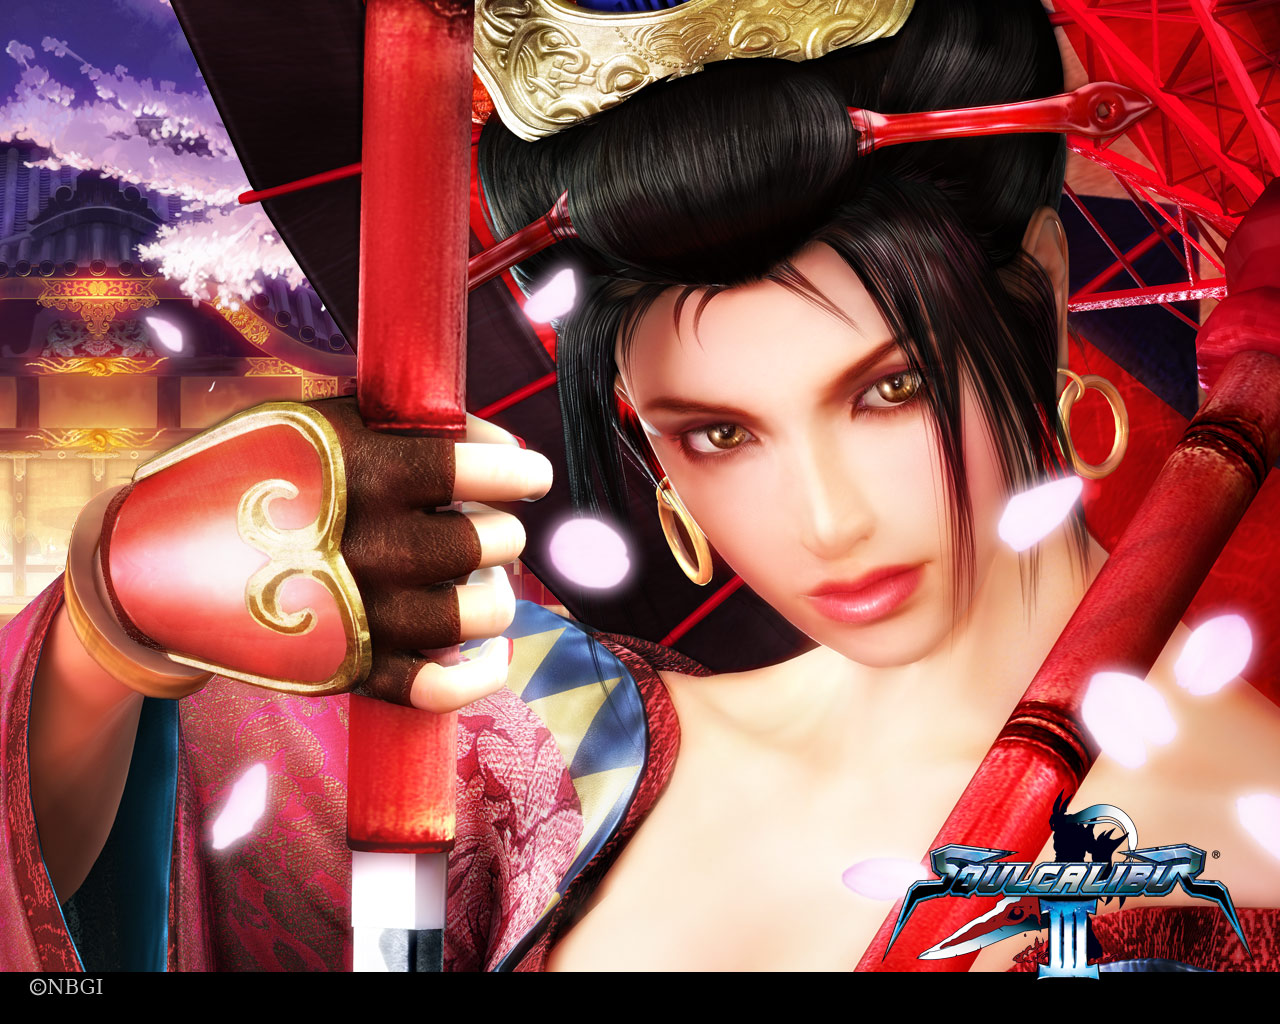 Girl Face Wallpaper Setsuka Soul Calibur